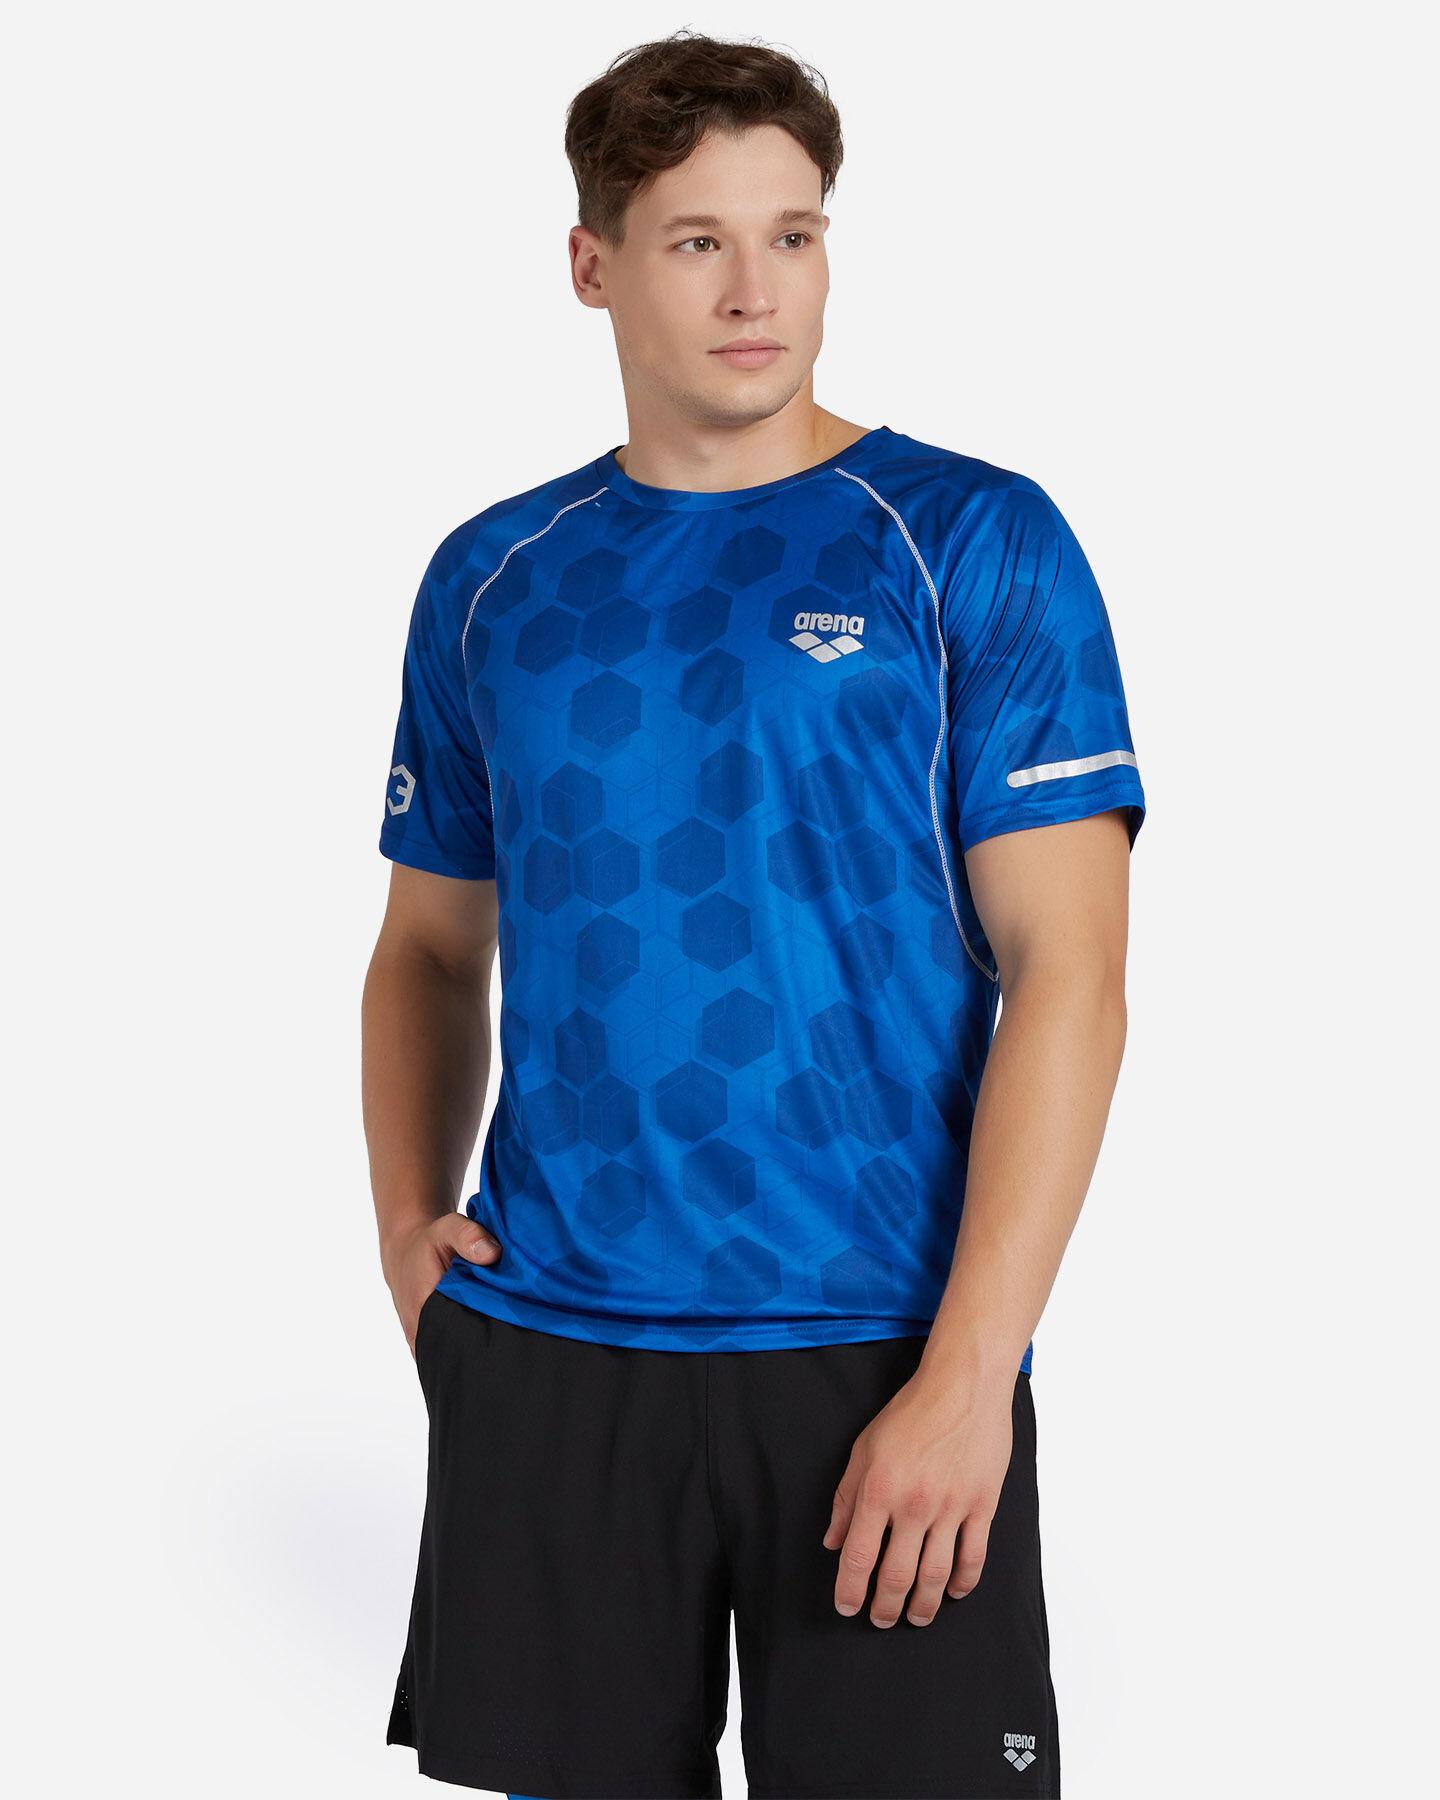 T-Shirt running ARENA ARN 073 M S4093395 scatto 0